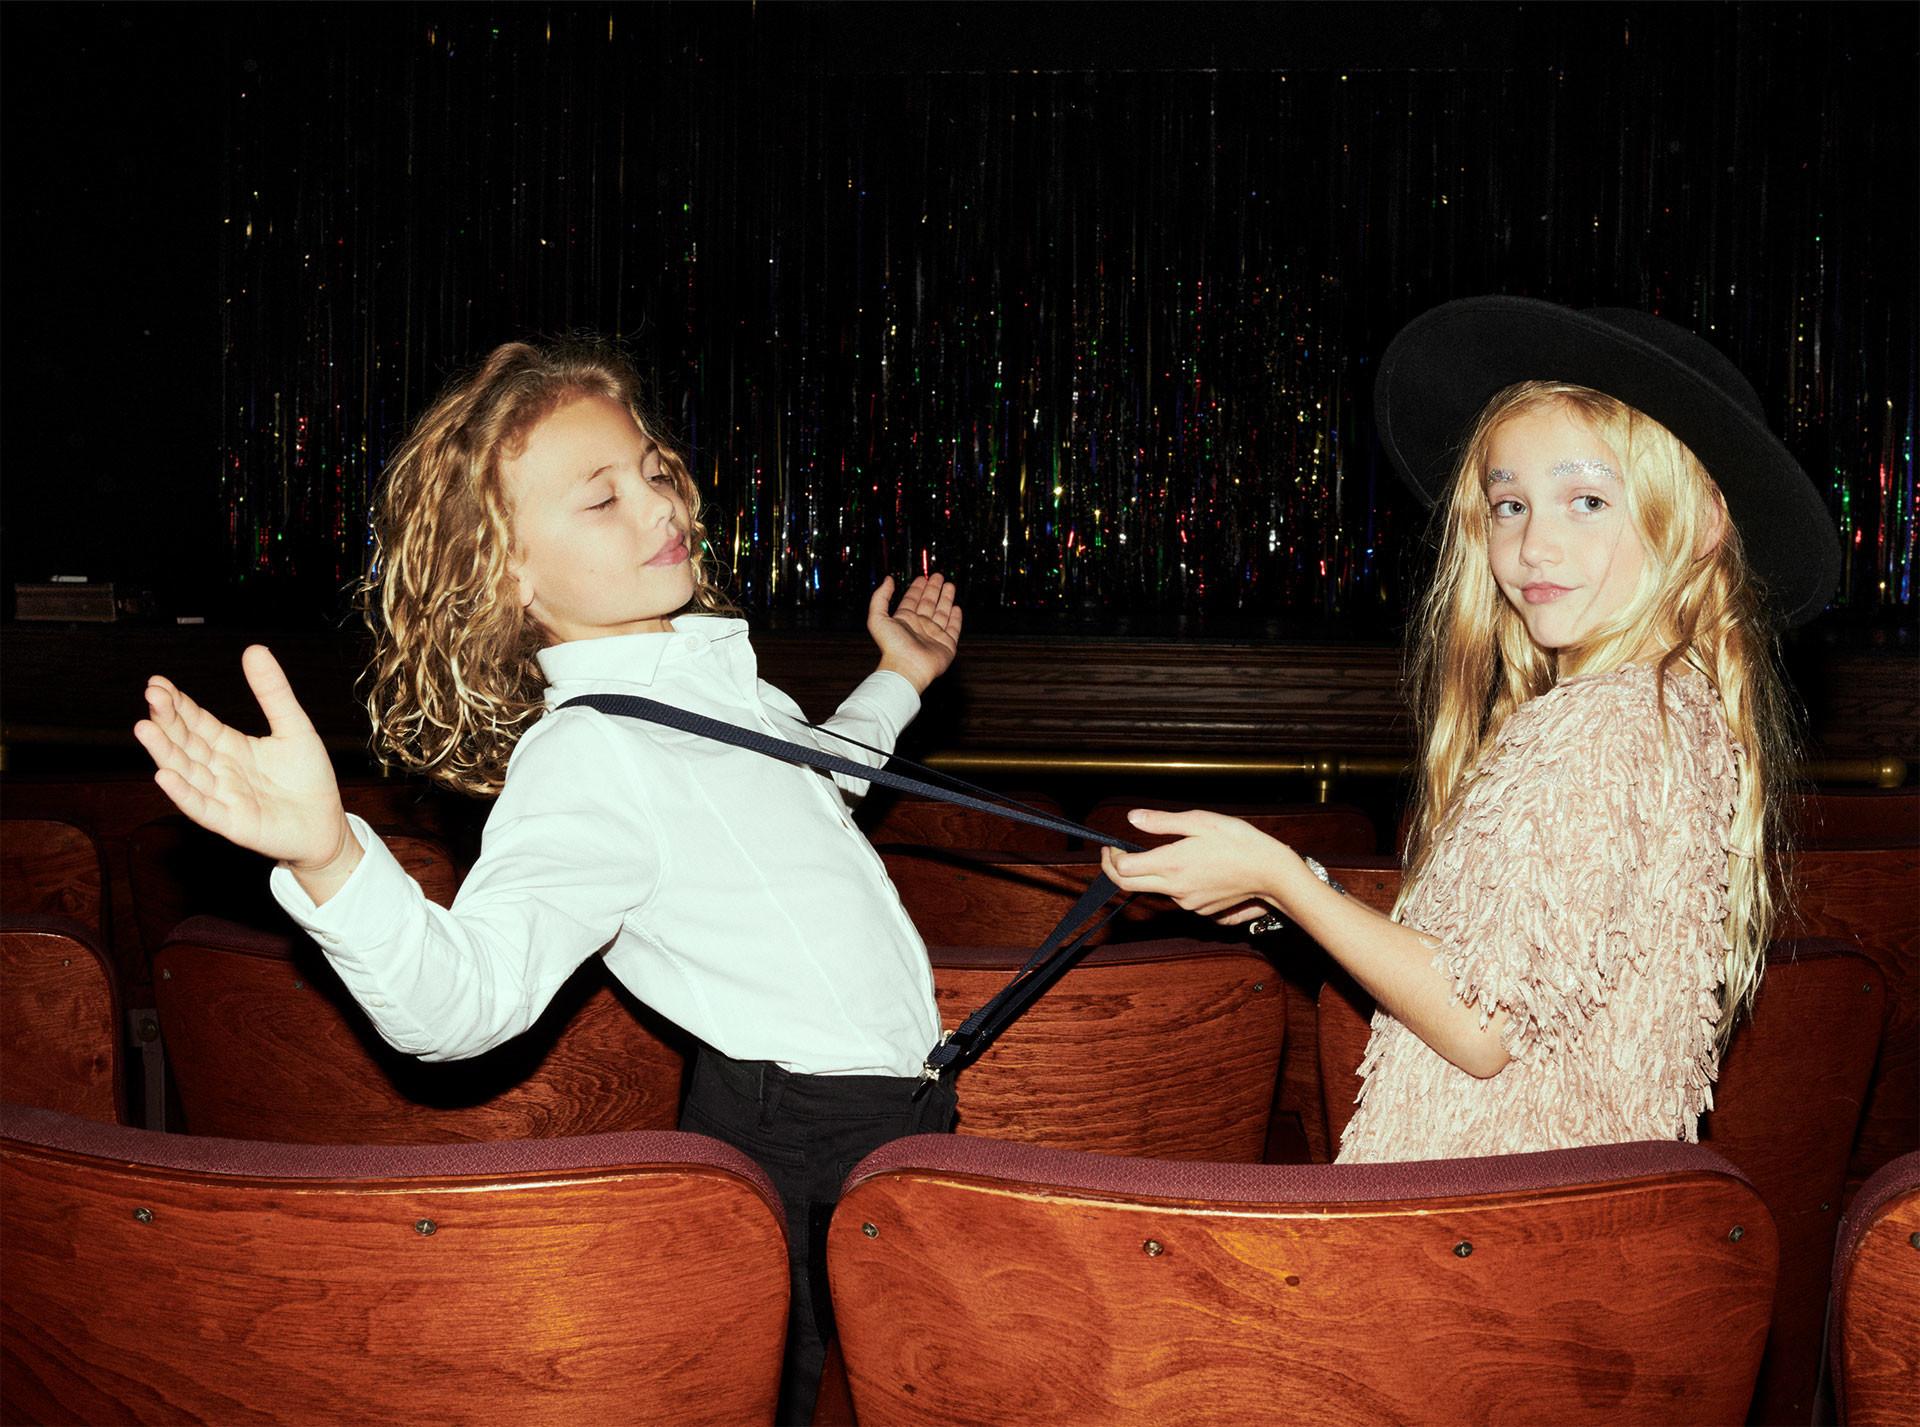 Zara Kids 'Magic Party'